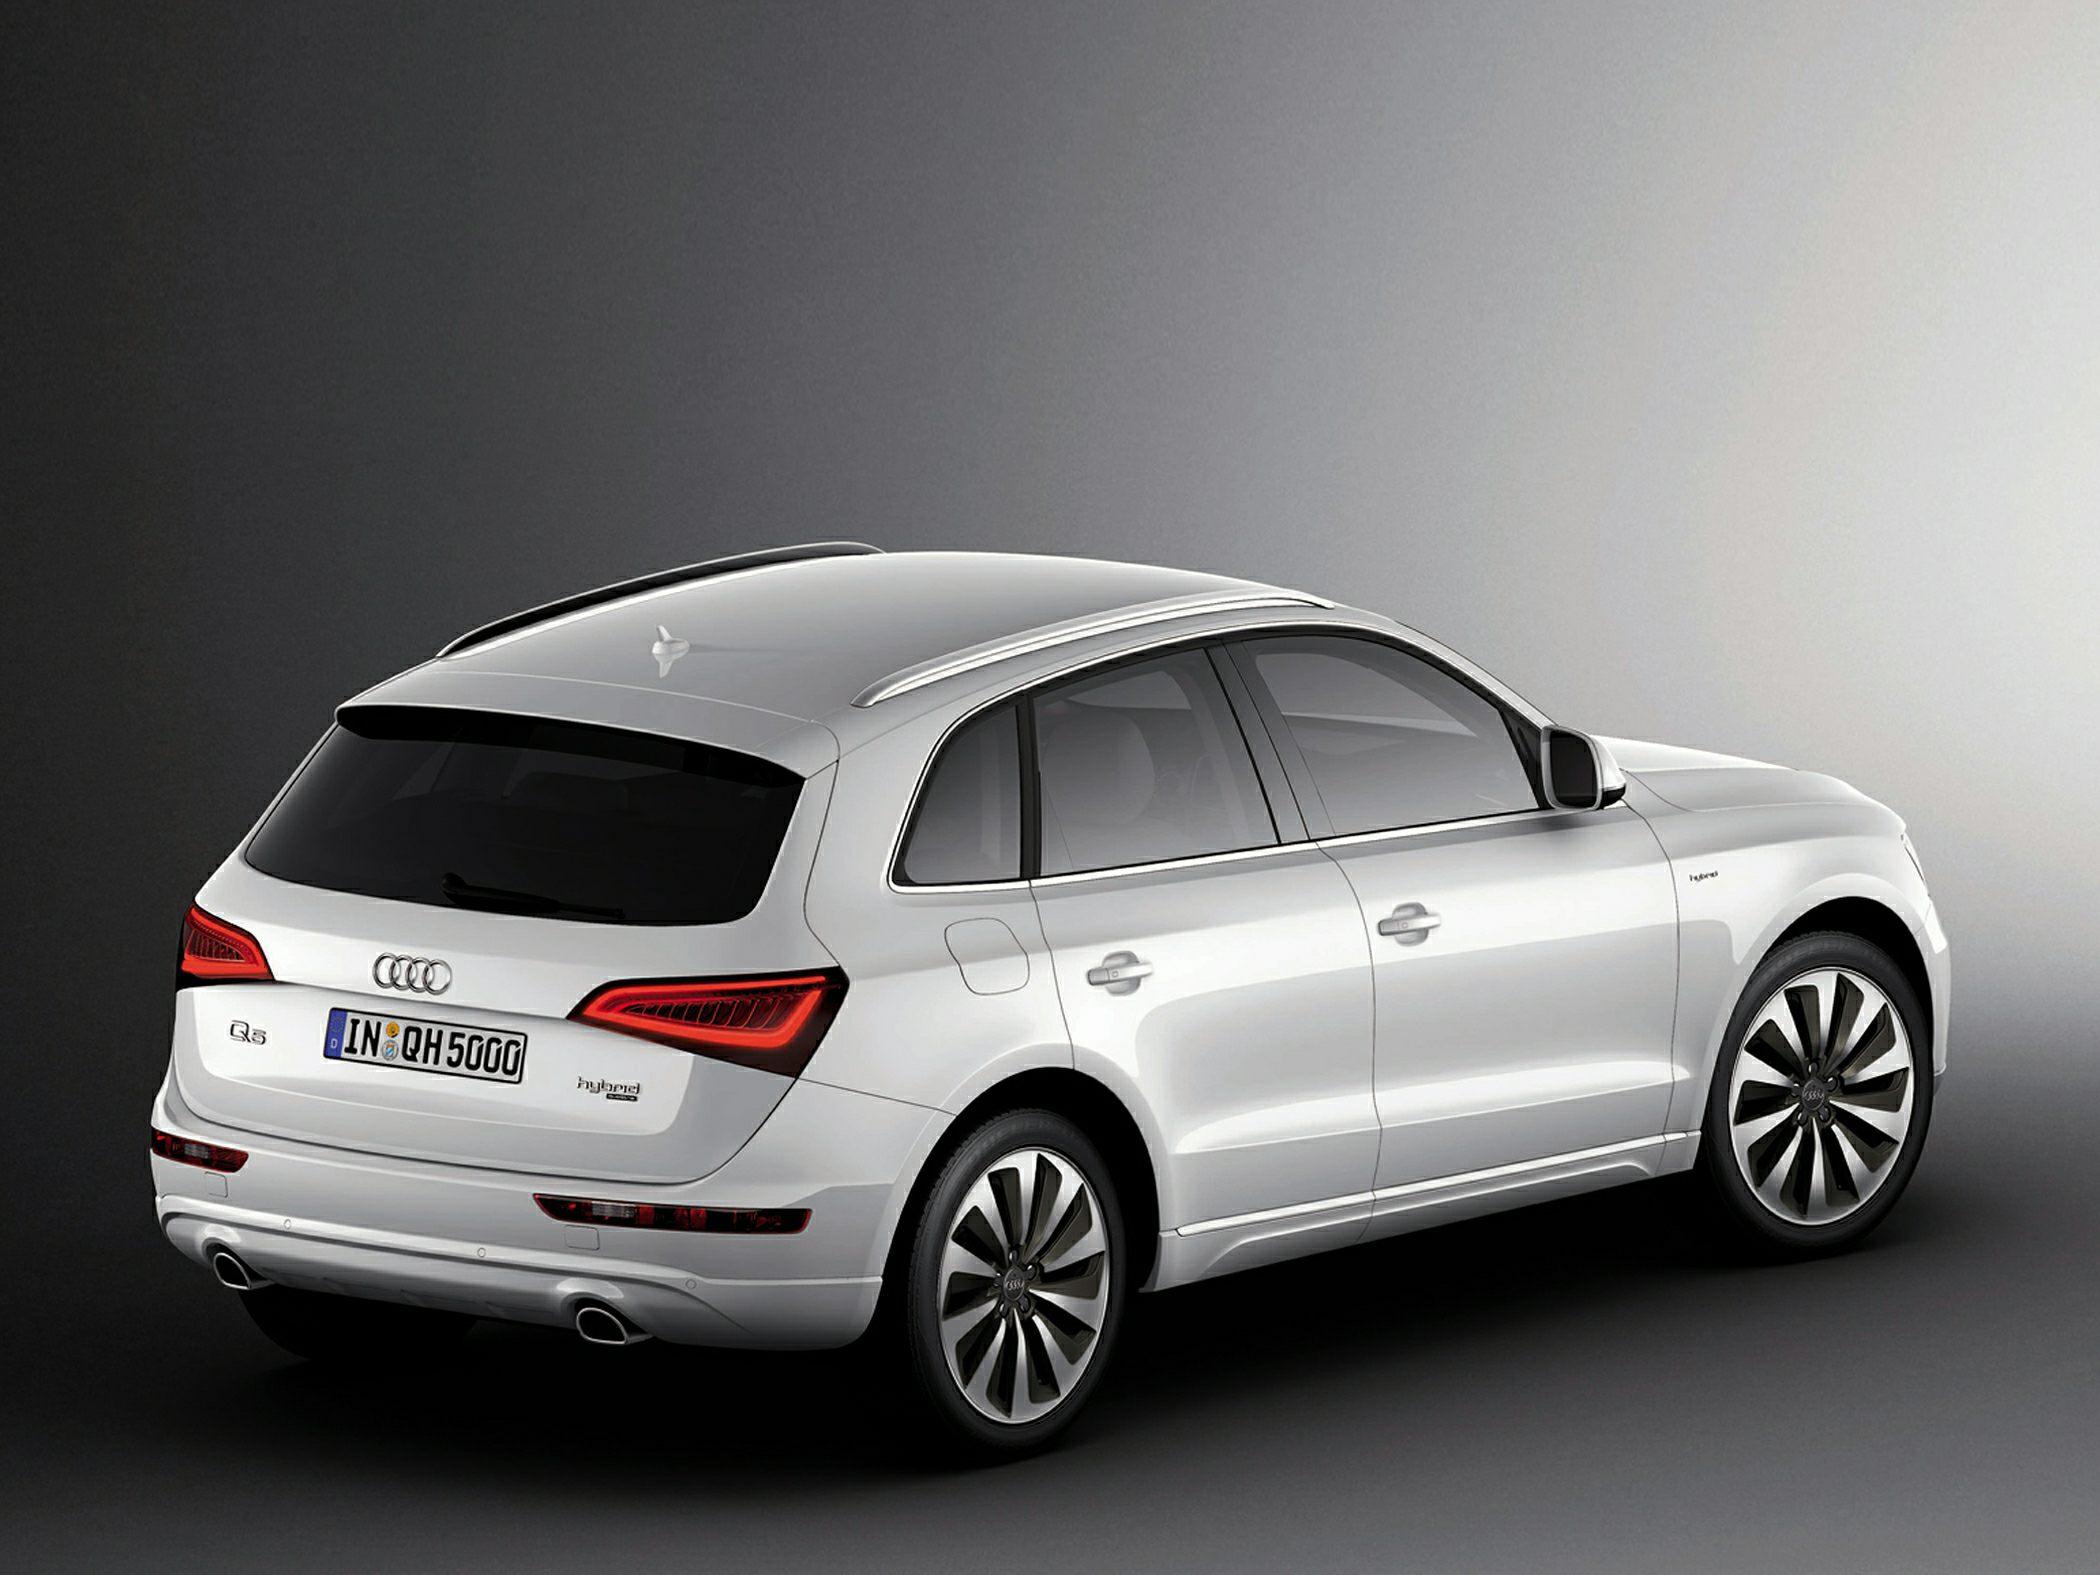 2015 Audi Q5 Hybrid Rear